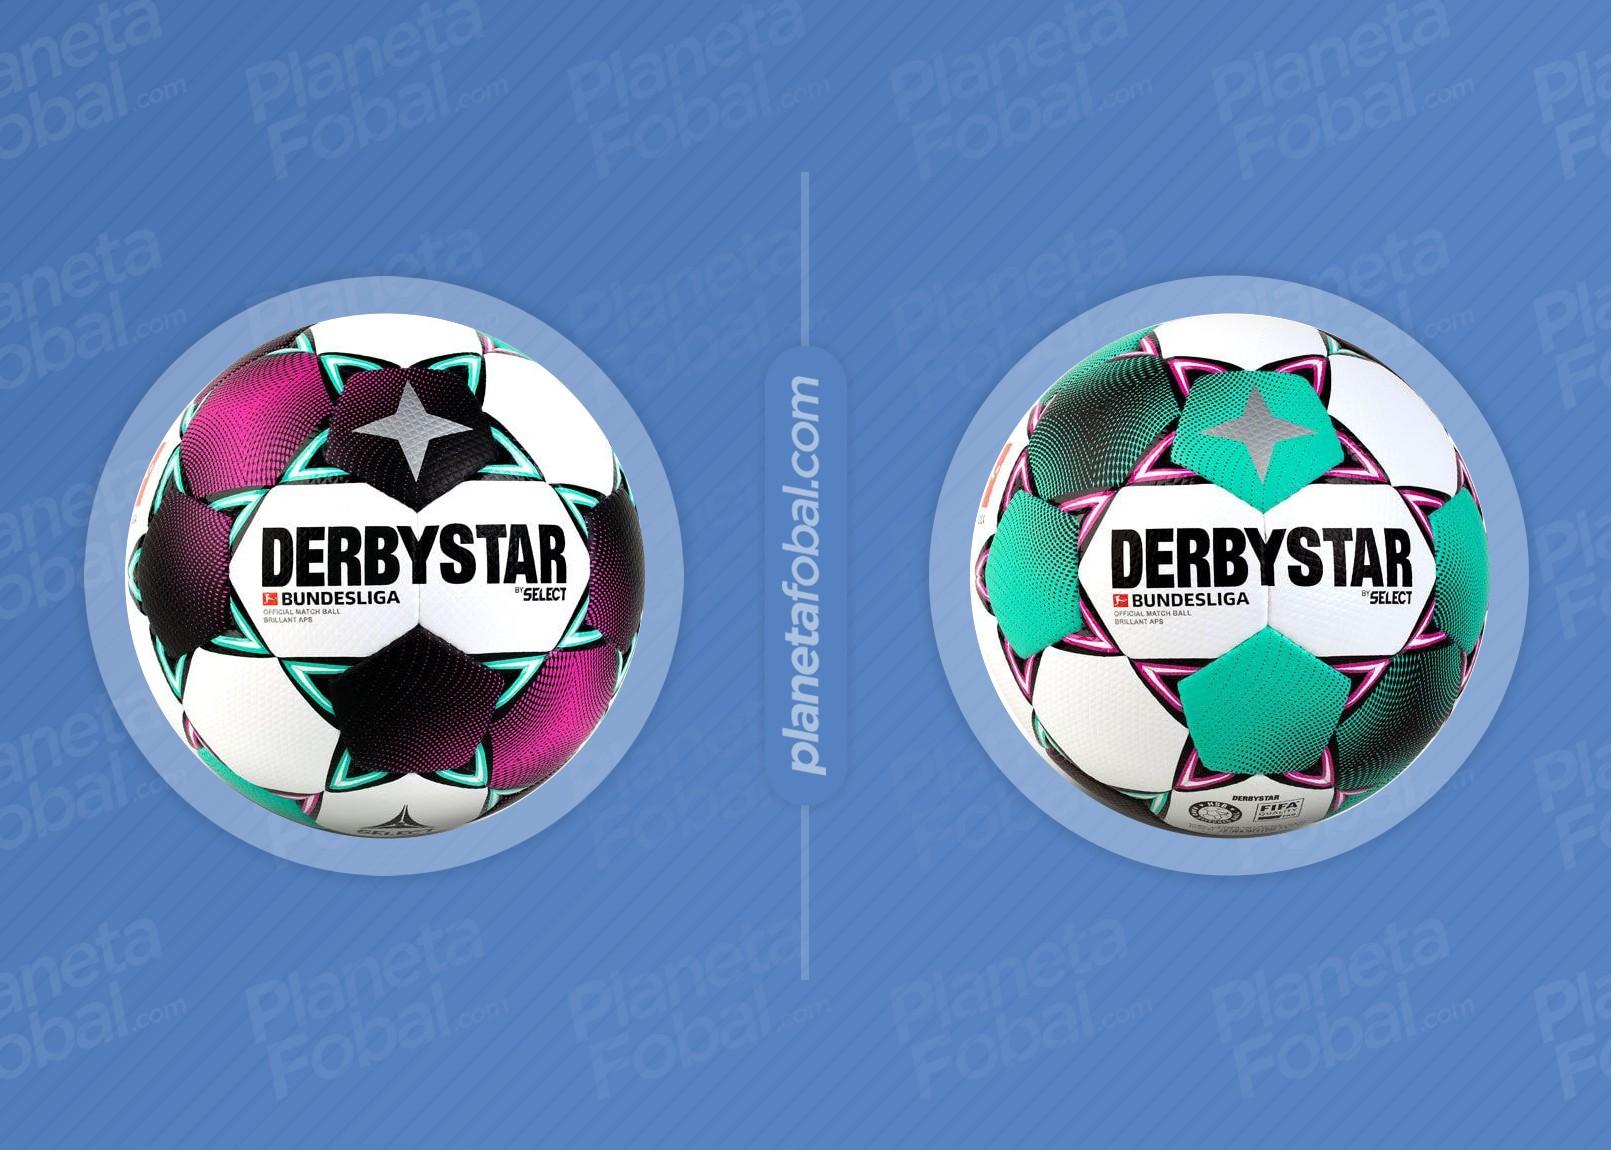 Balón Derbystar Bundesliga 2020/2021 | Imagen Web Oficial